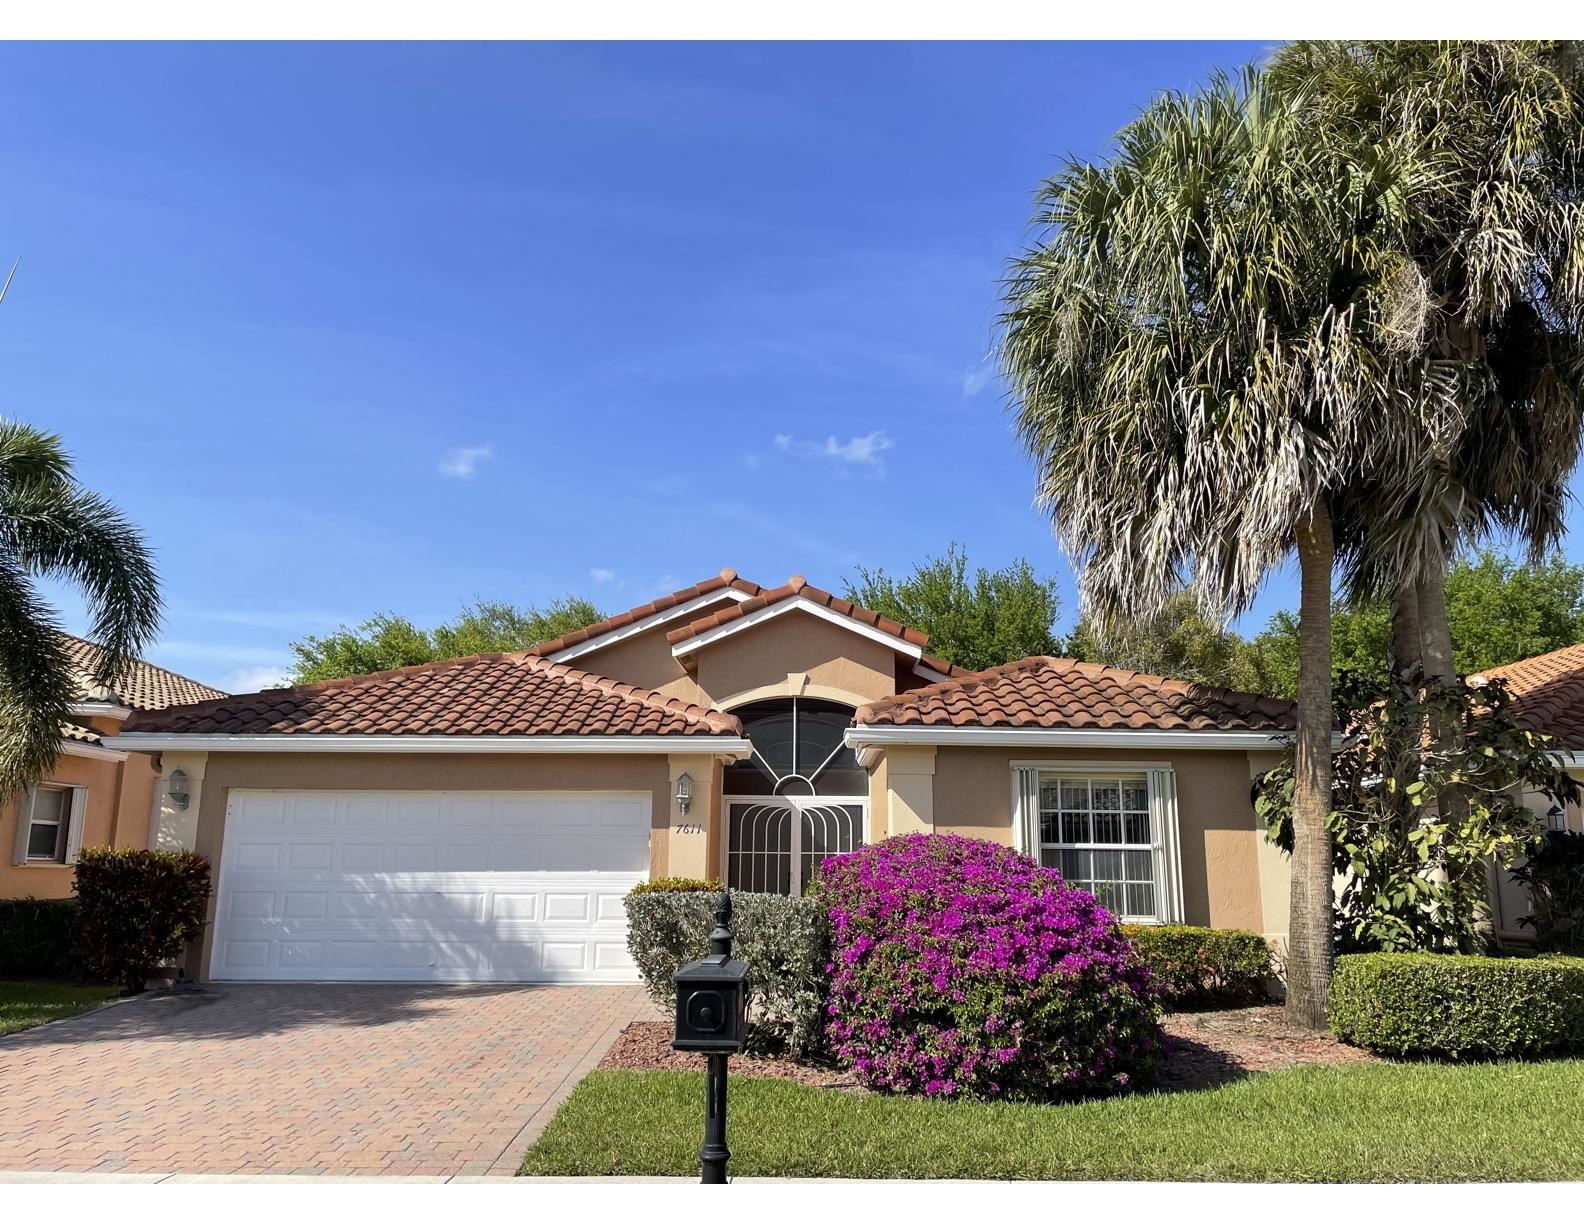 7611 Viniste Drive, Boynton Beach, FL 33472 - #: RX-10692153